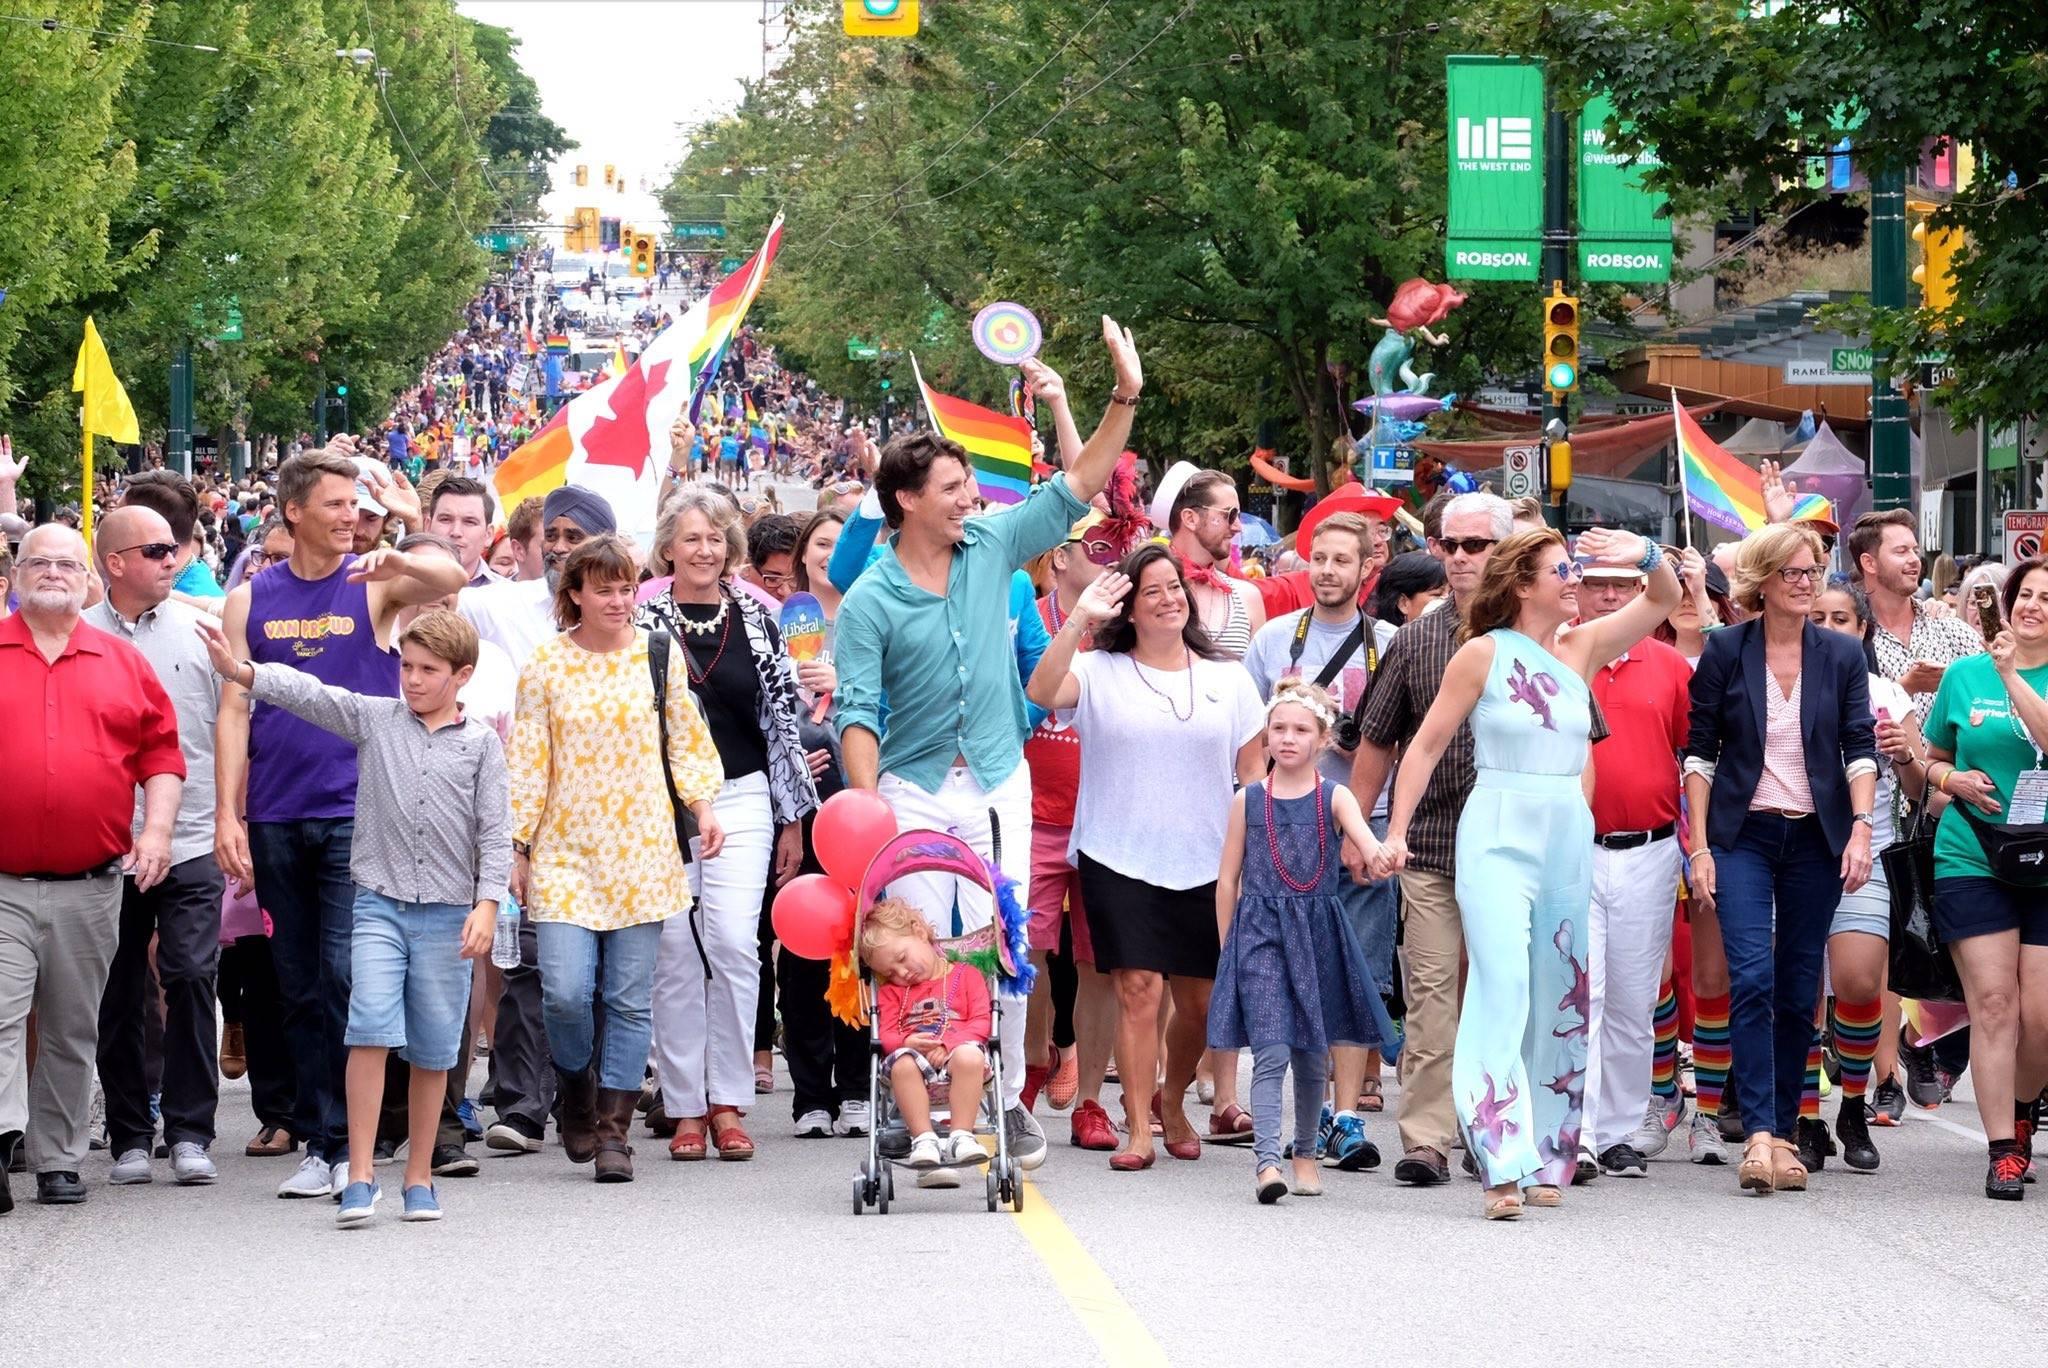 Justin Trudeau marches in Vancouver Pride Parade. (Photo: Justin Trudeau/Facebook)